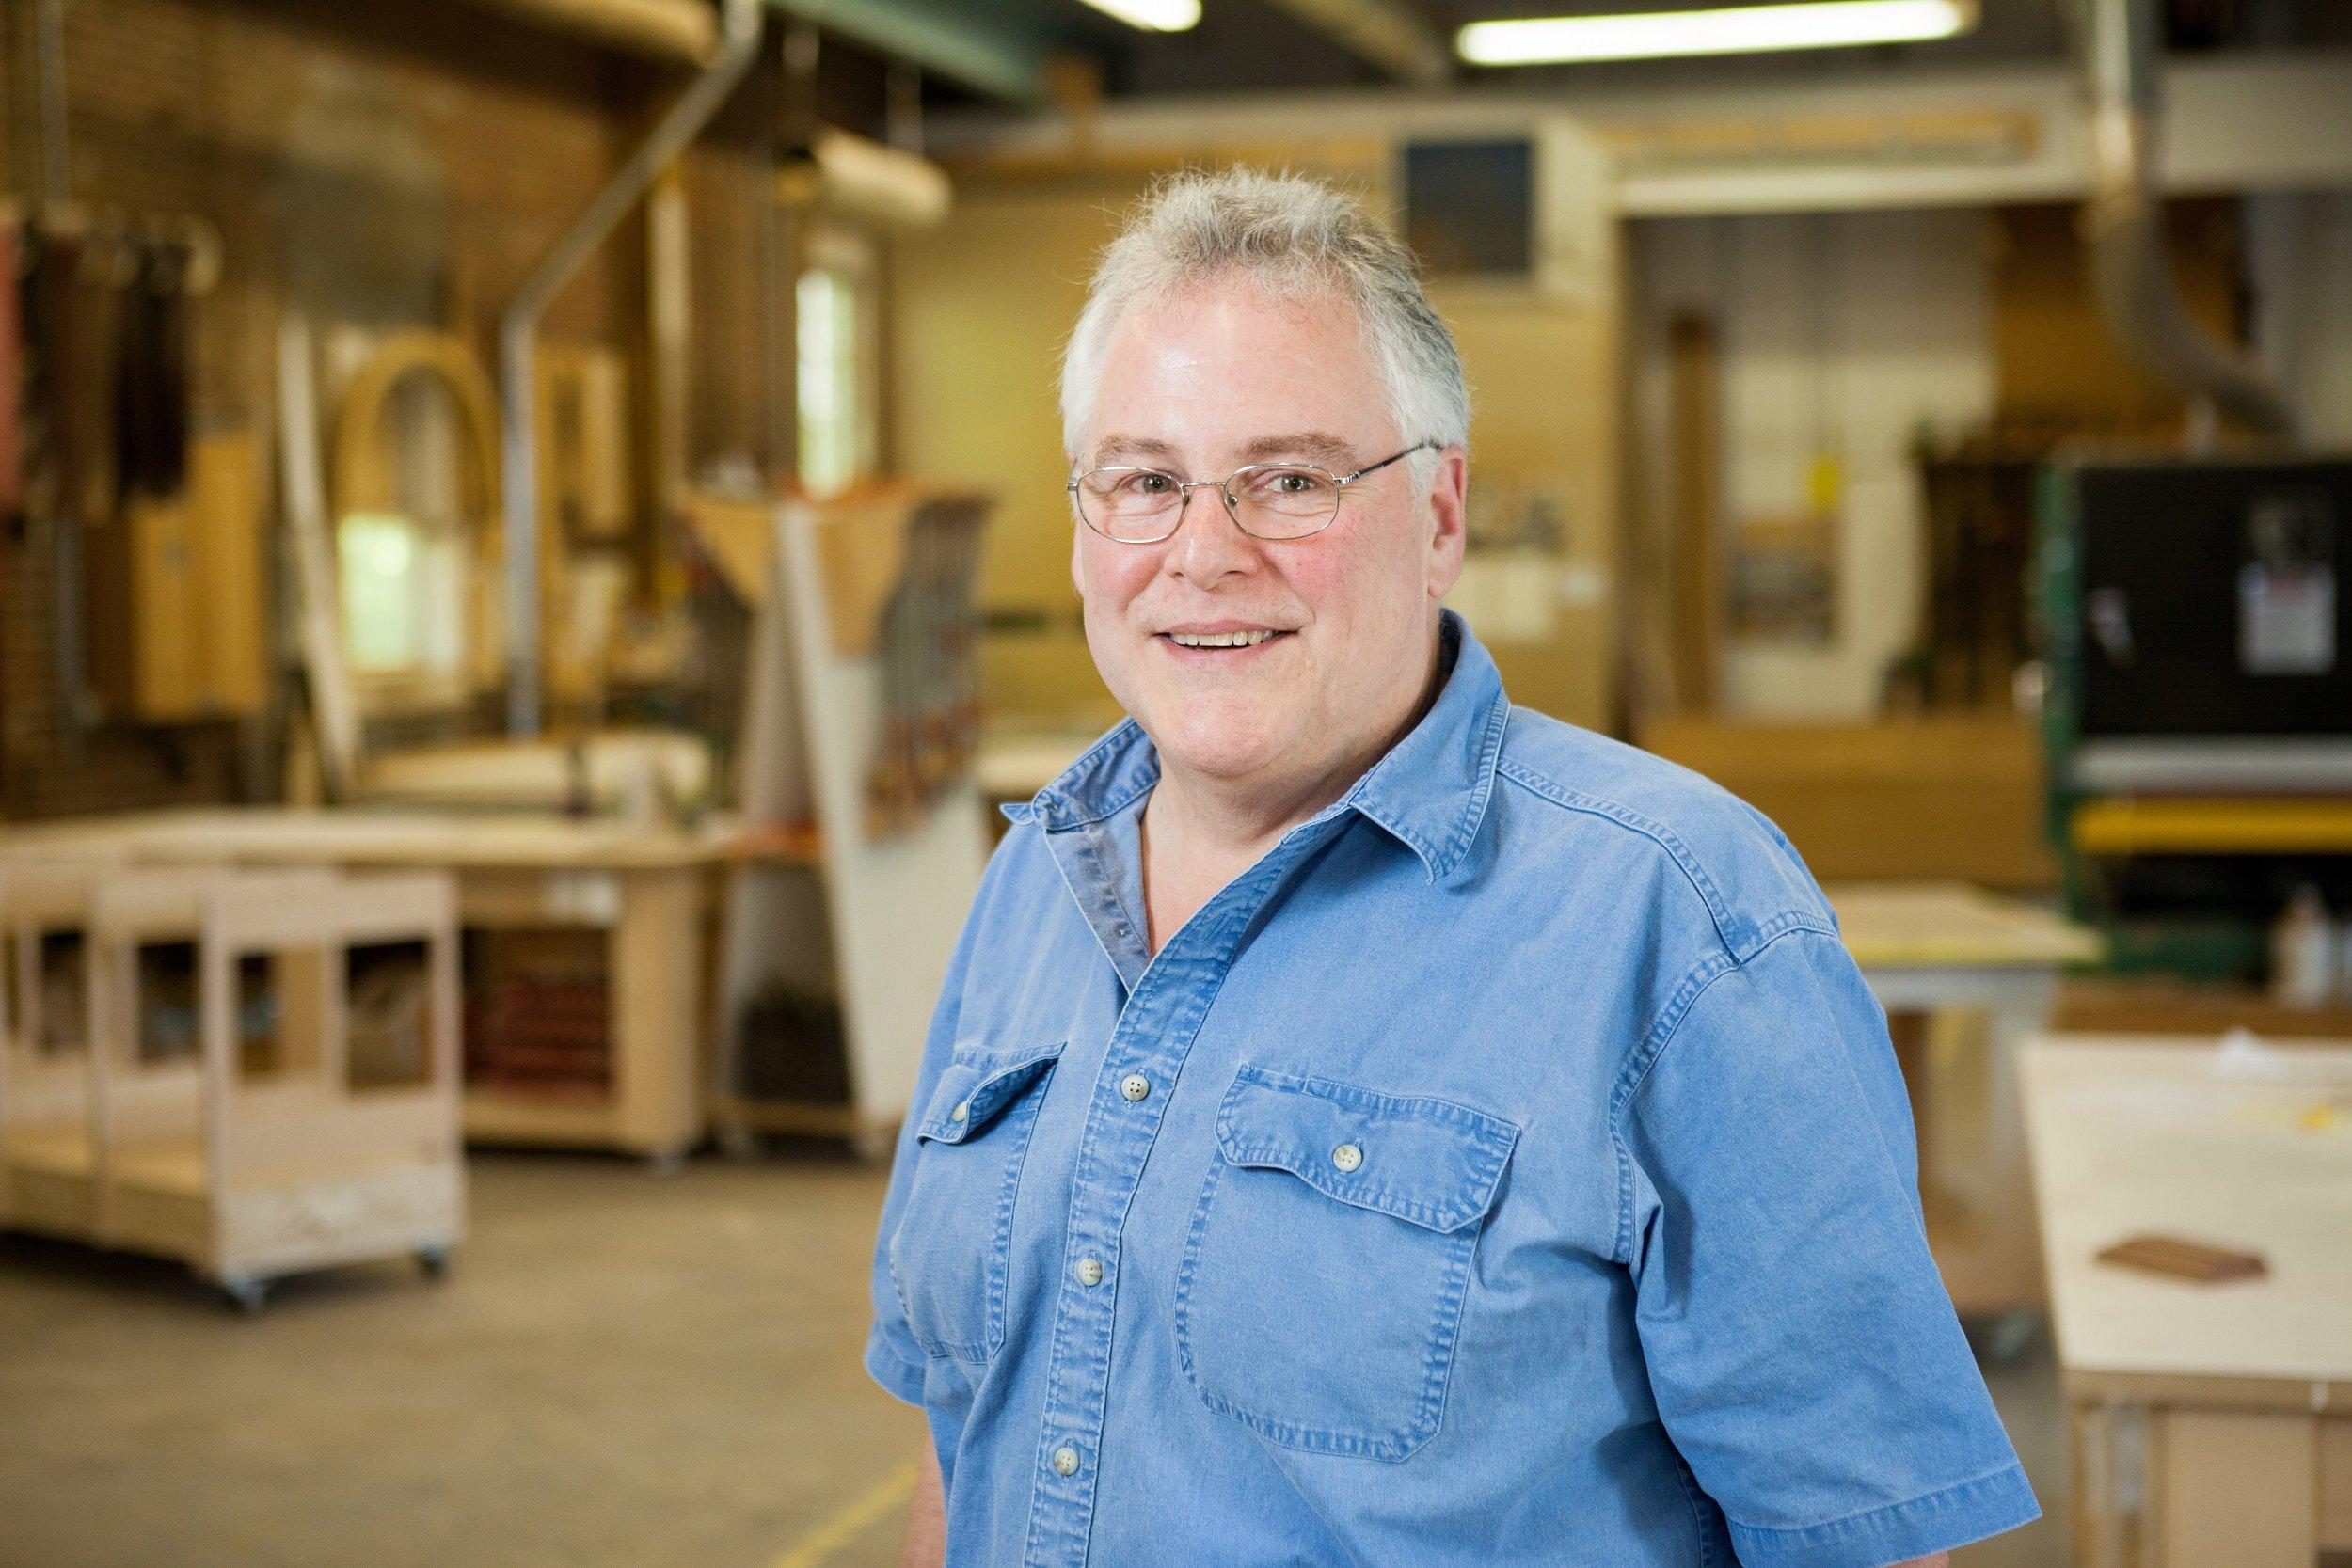 Steve Szabo - A Woodworking Prodigy